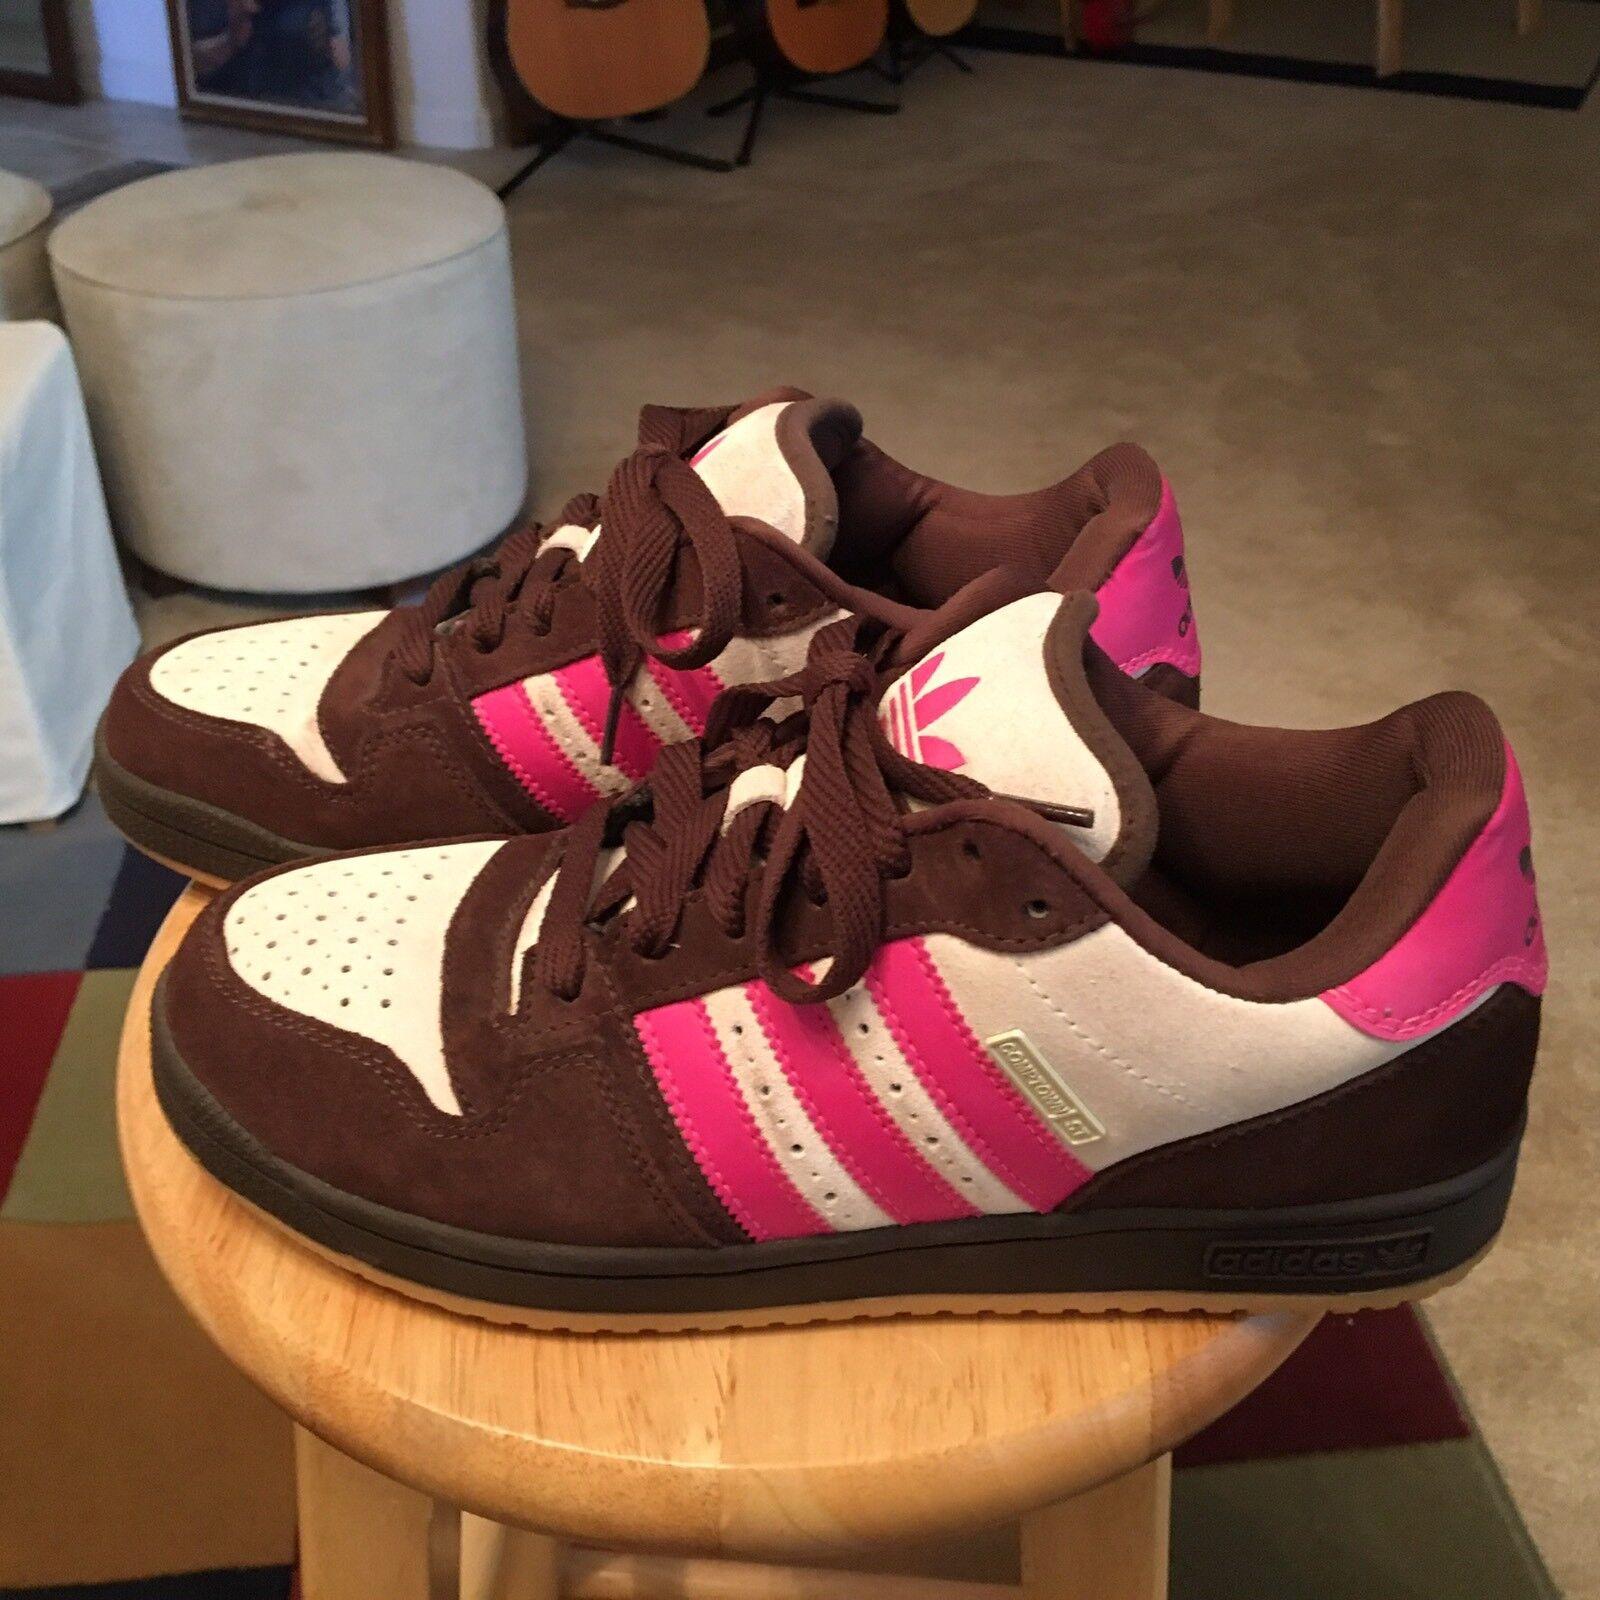 Adidas Compton St Brown Cream Men's US11 Suede Gum Sole Ahtletic Sneakers shoes